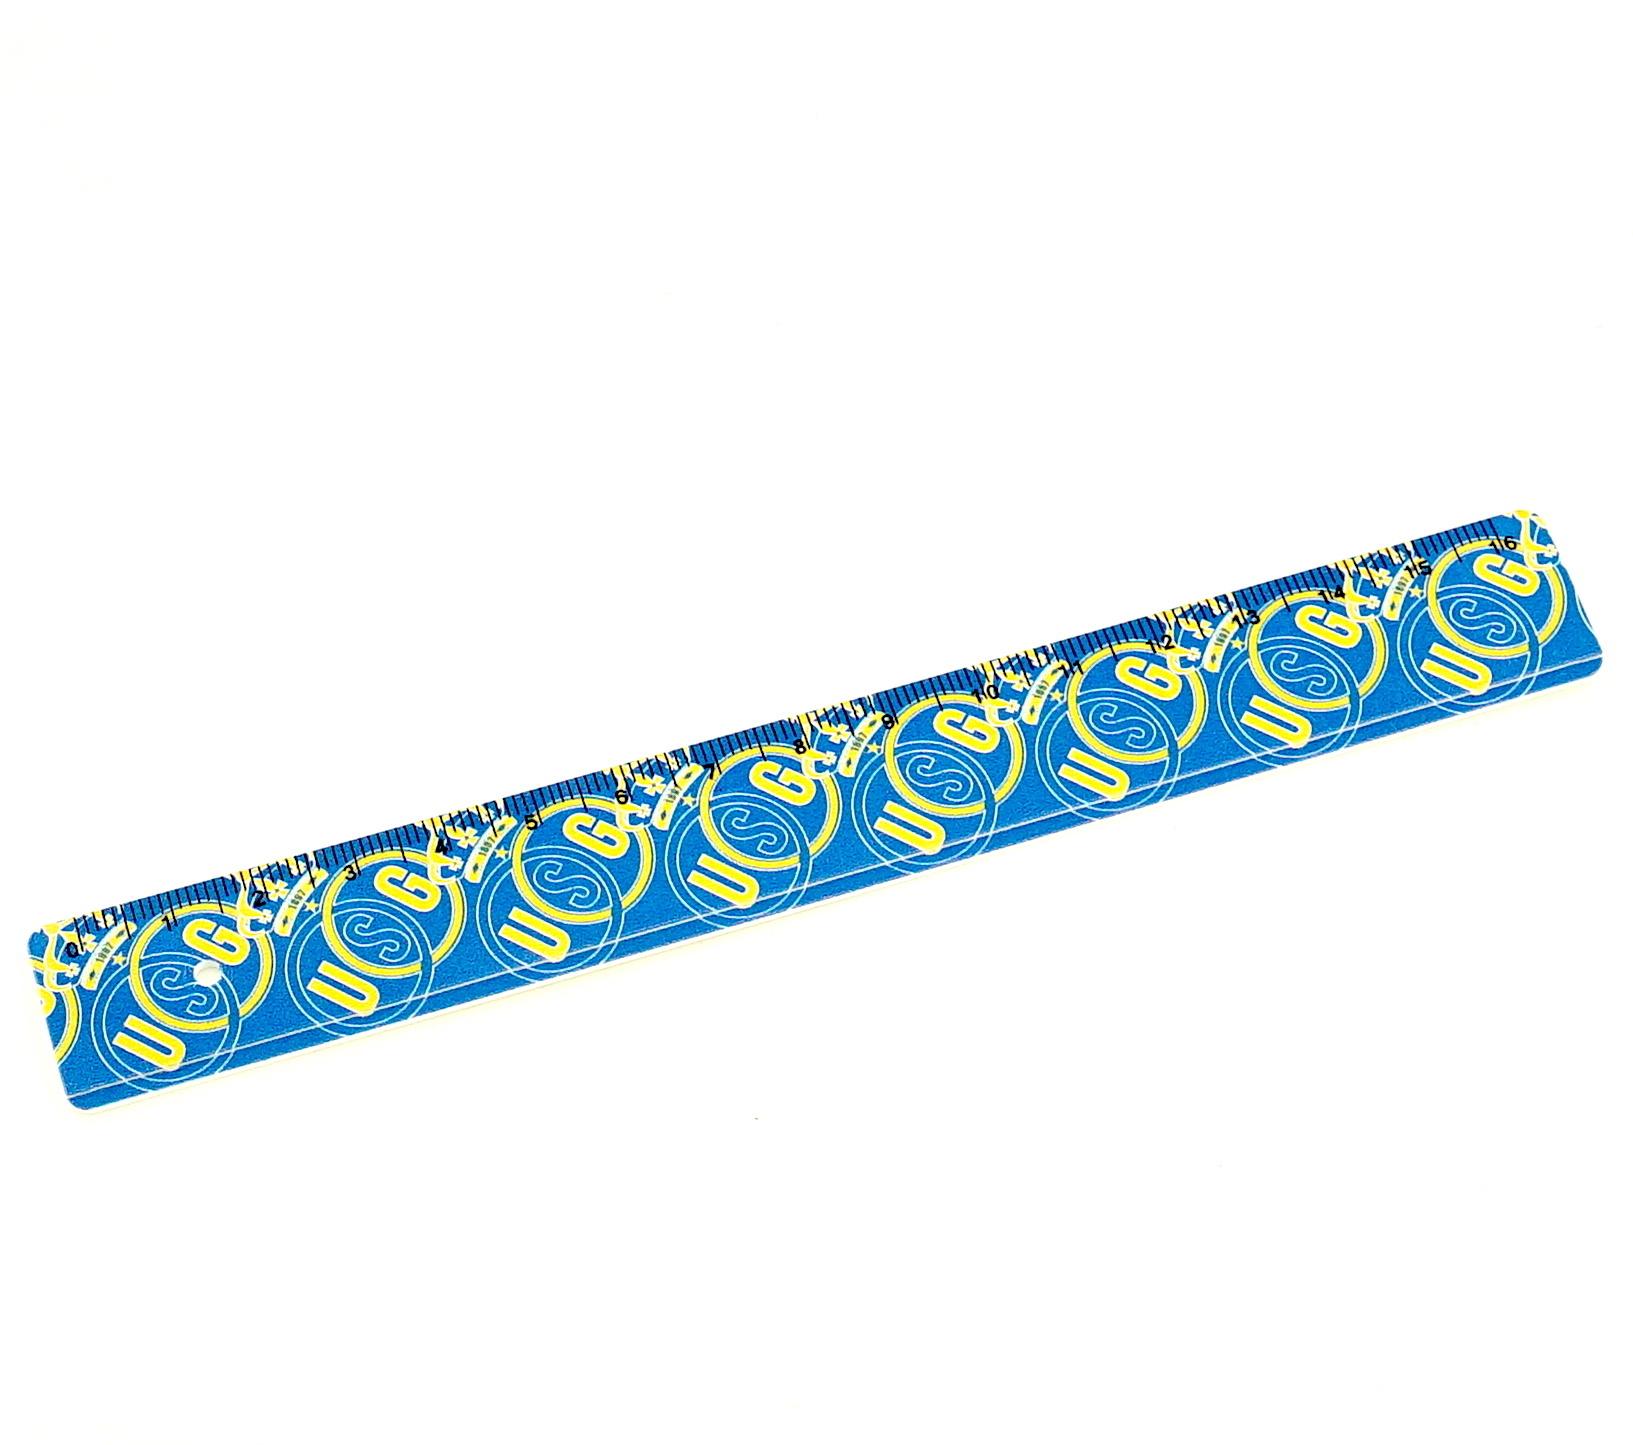 Topfanz Ruler 16cm